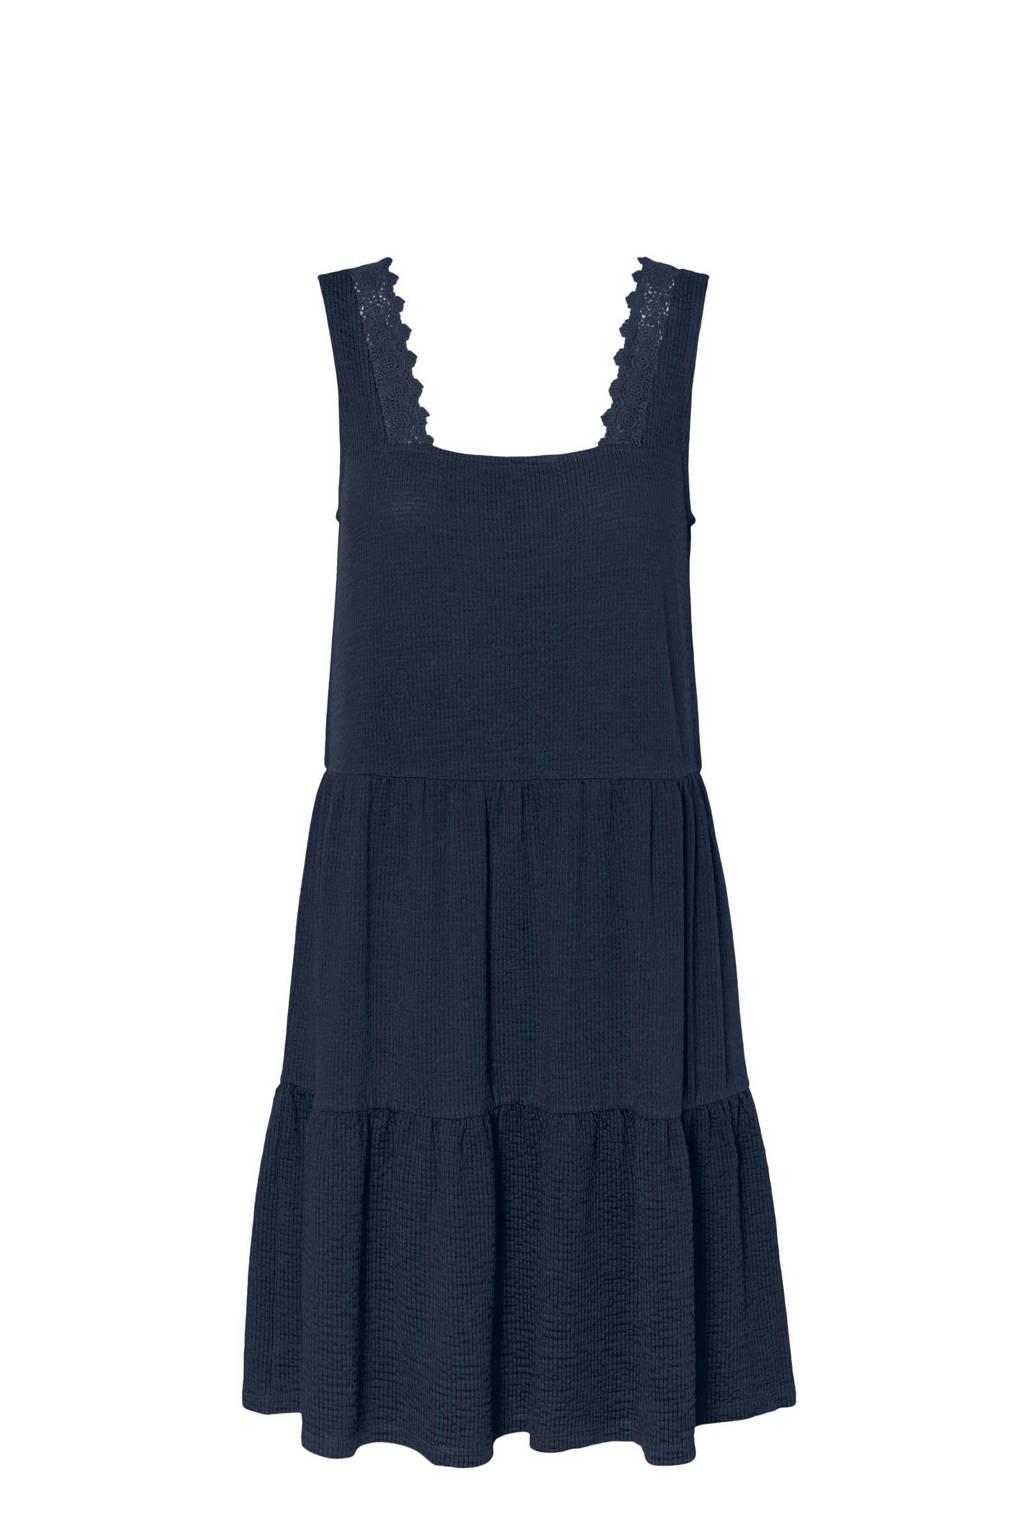 VERO MODA CURVE A-lijn jurk VMALICE van gerecycled polyester donkerblauw, Donkerblauw